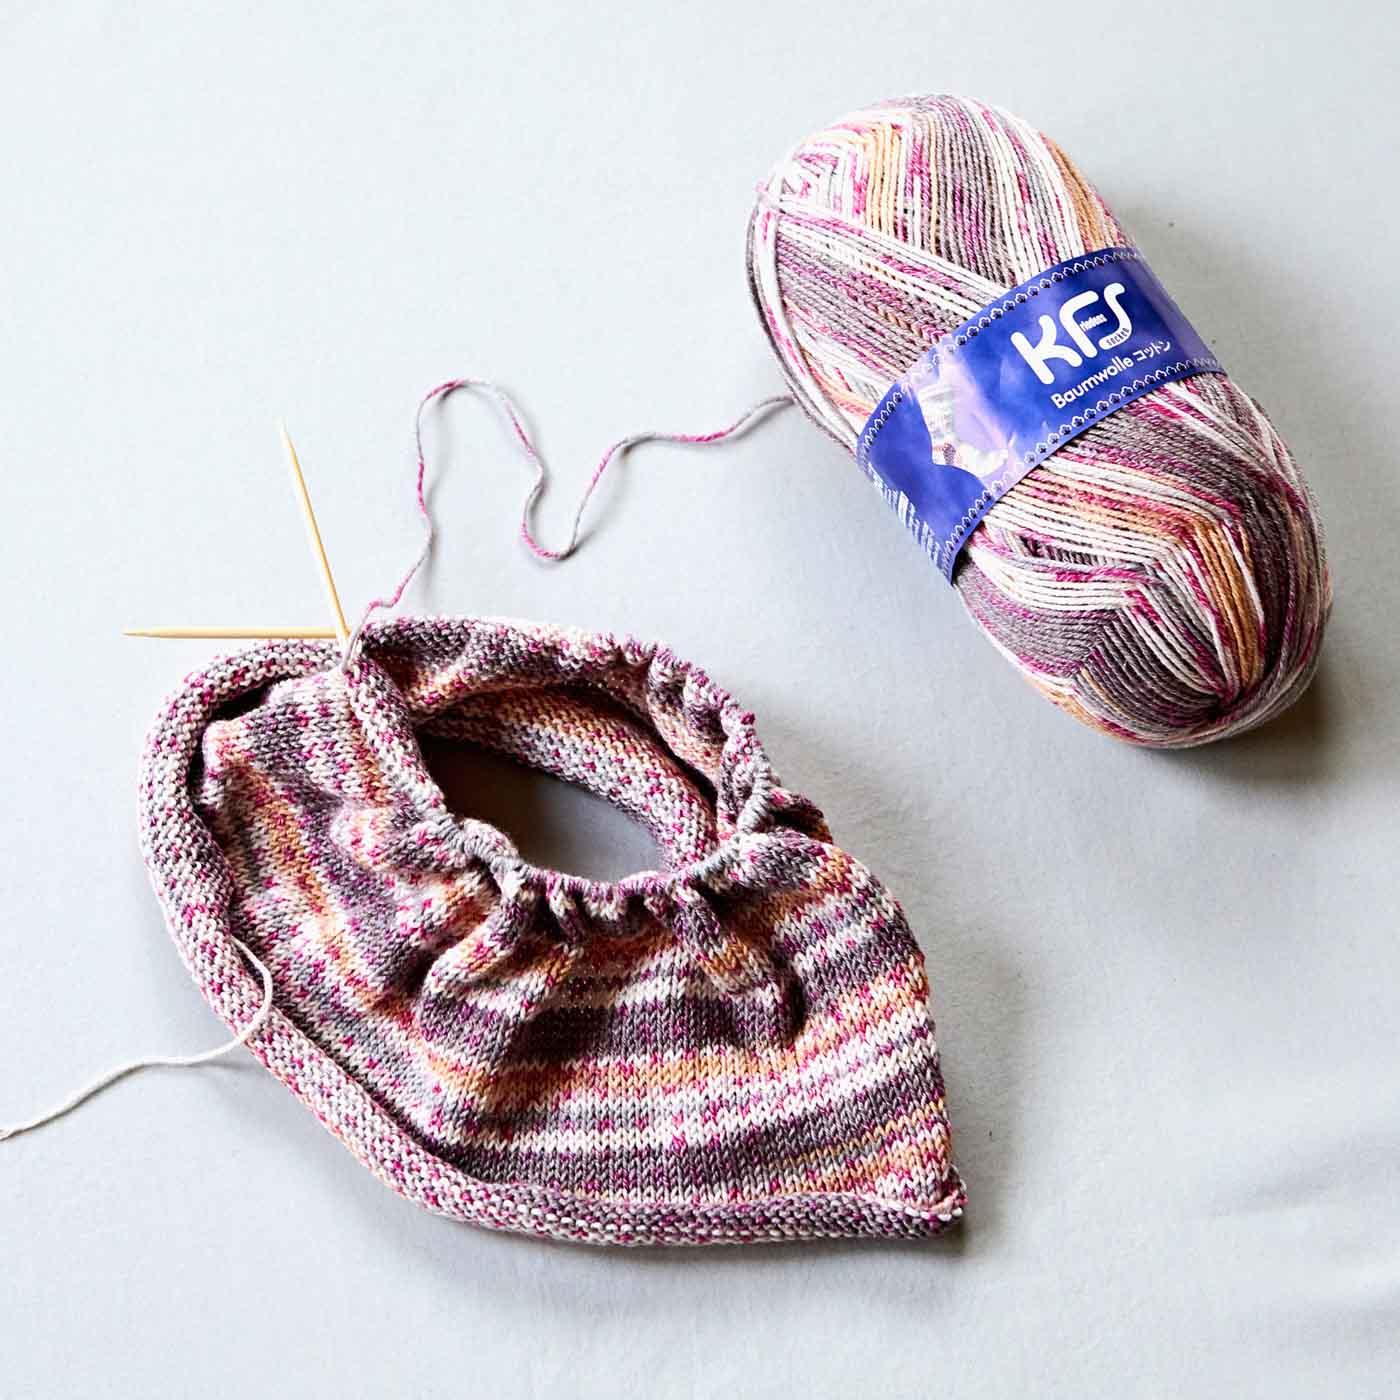 Opalの糸を編むのにぴったりの太さ。(※糸は別売りです。)